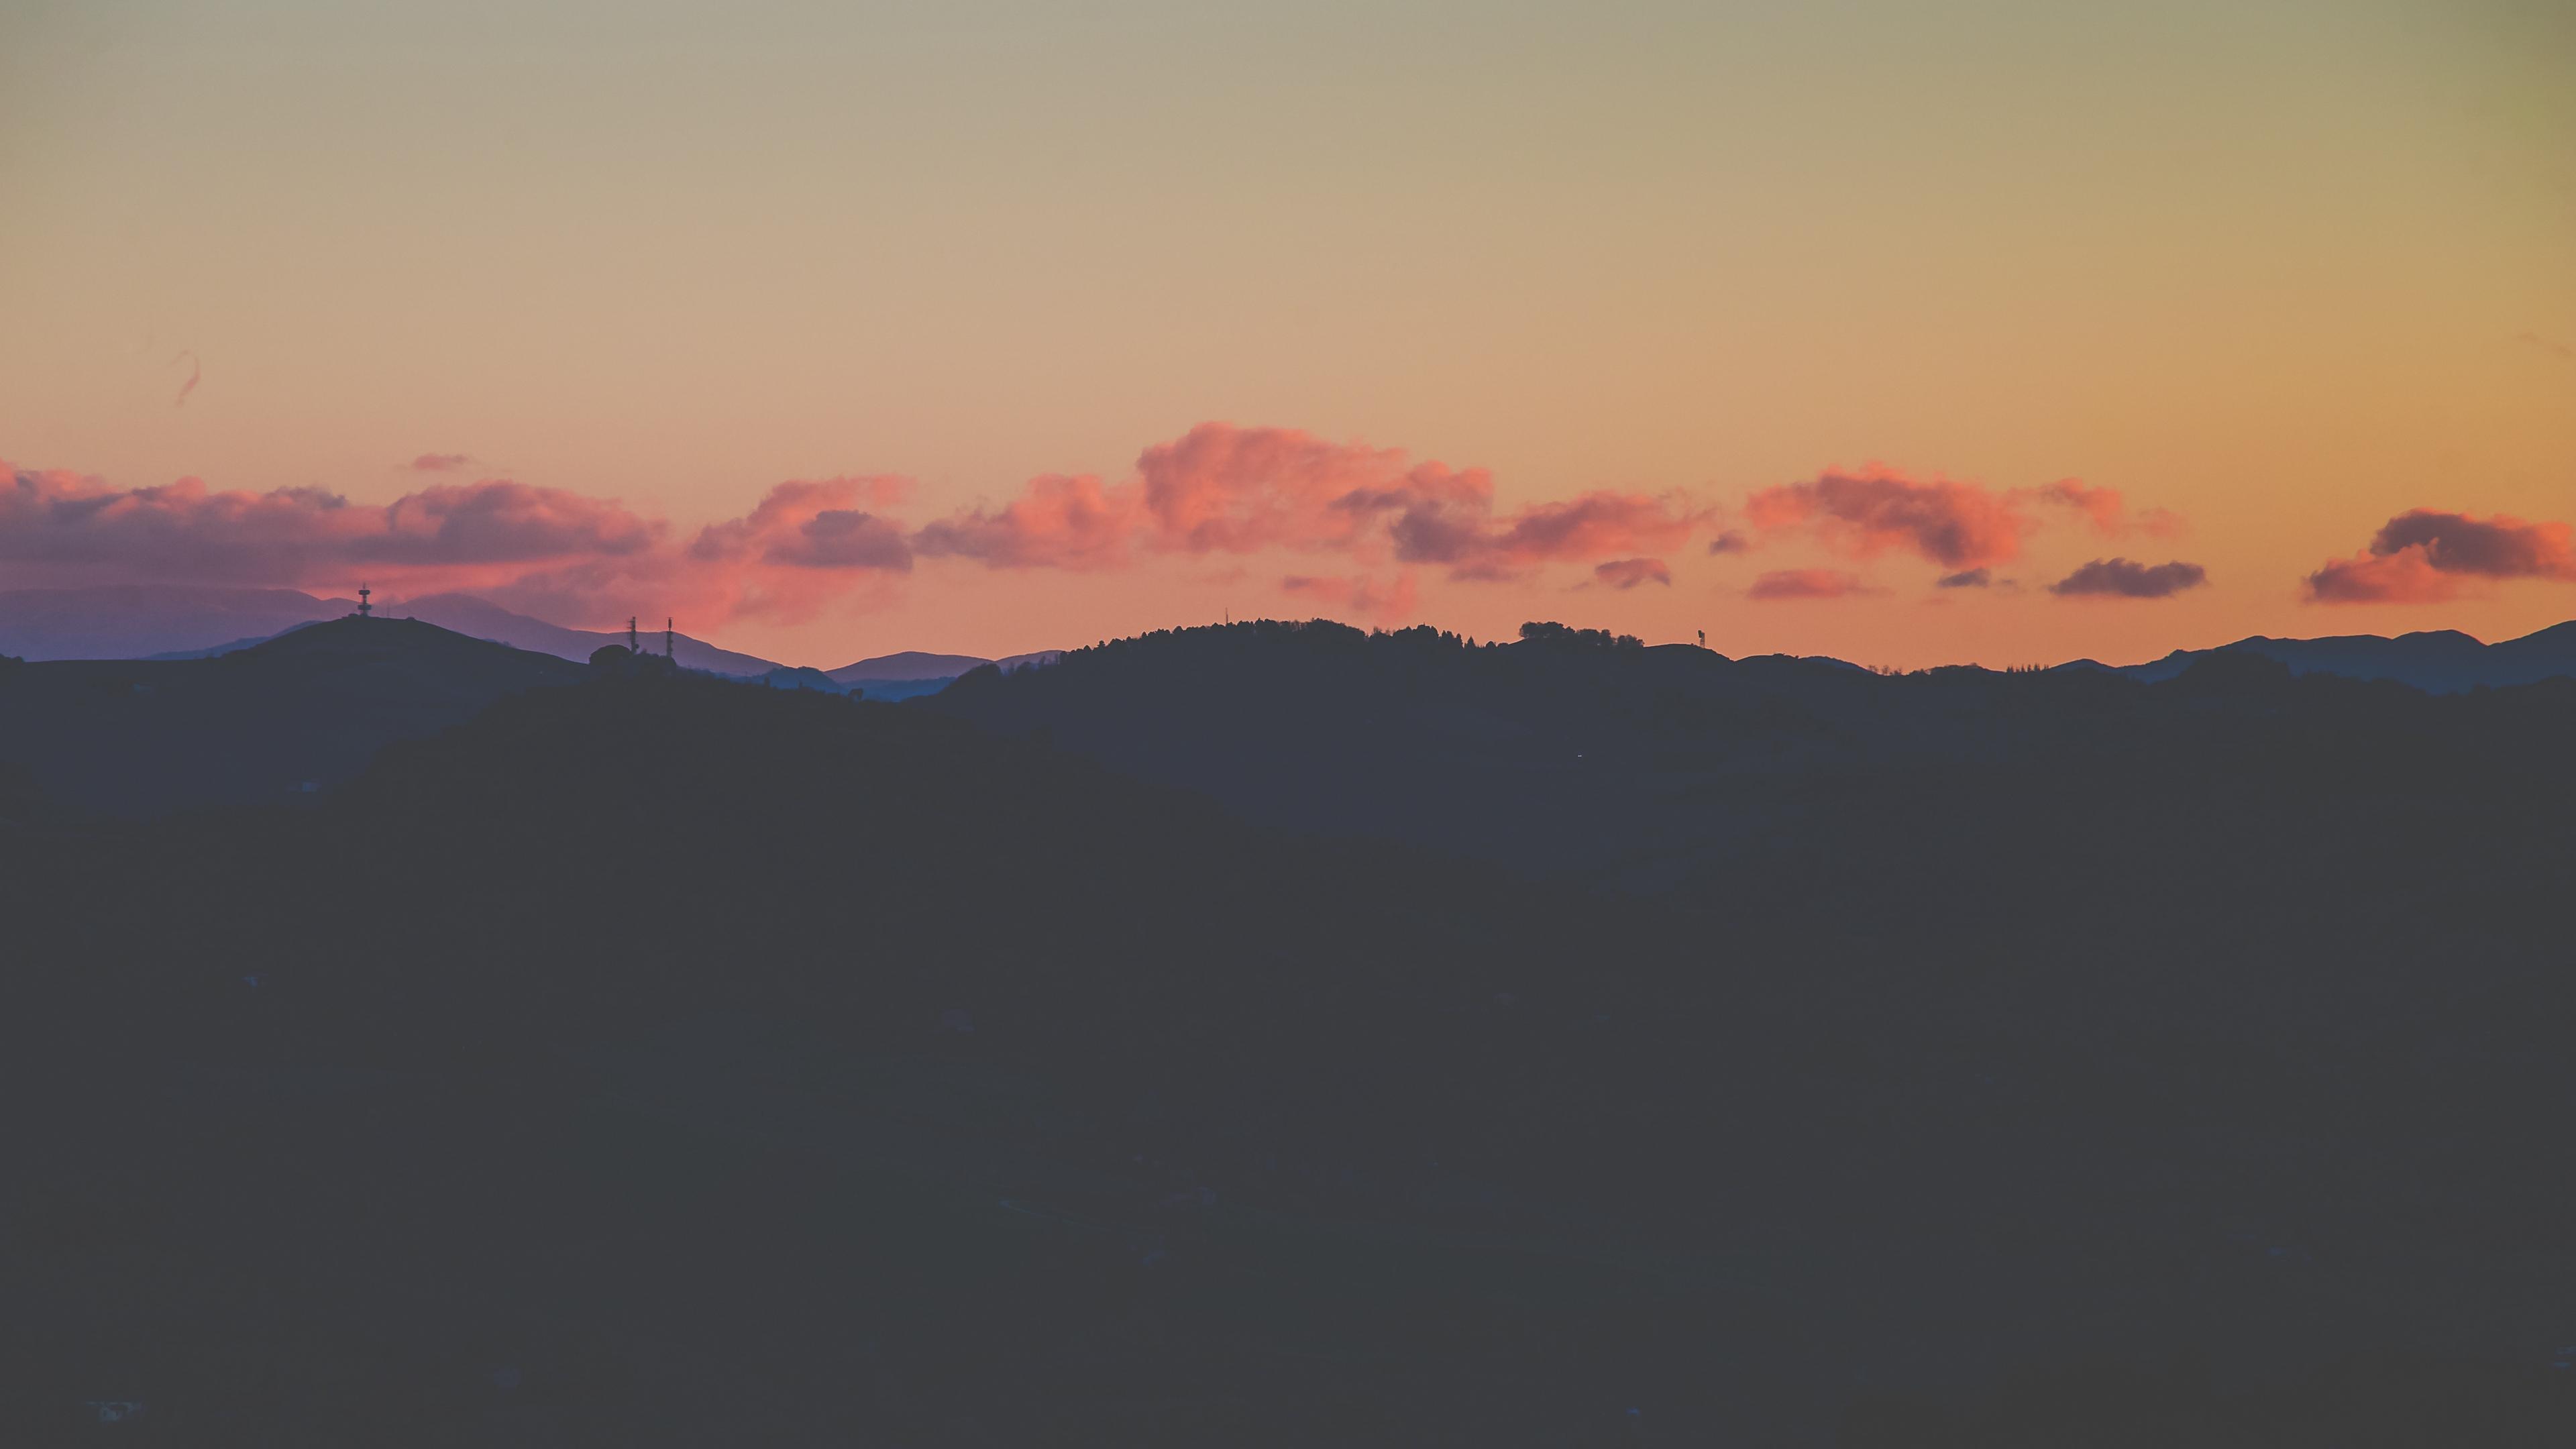 sunset horizon sky clouds night 4k 1540575336 - sunset, horizon, sky, clouds, night 4k - sunset, Sky, Horizon